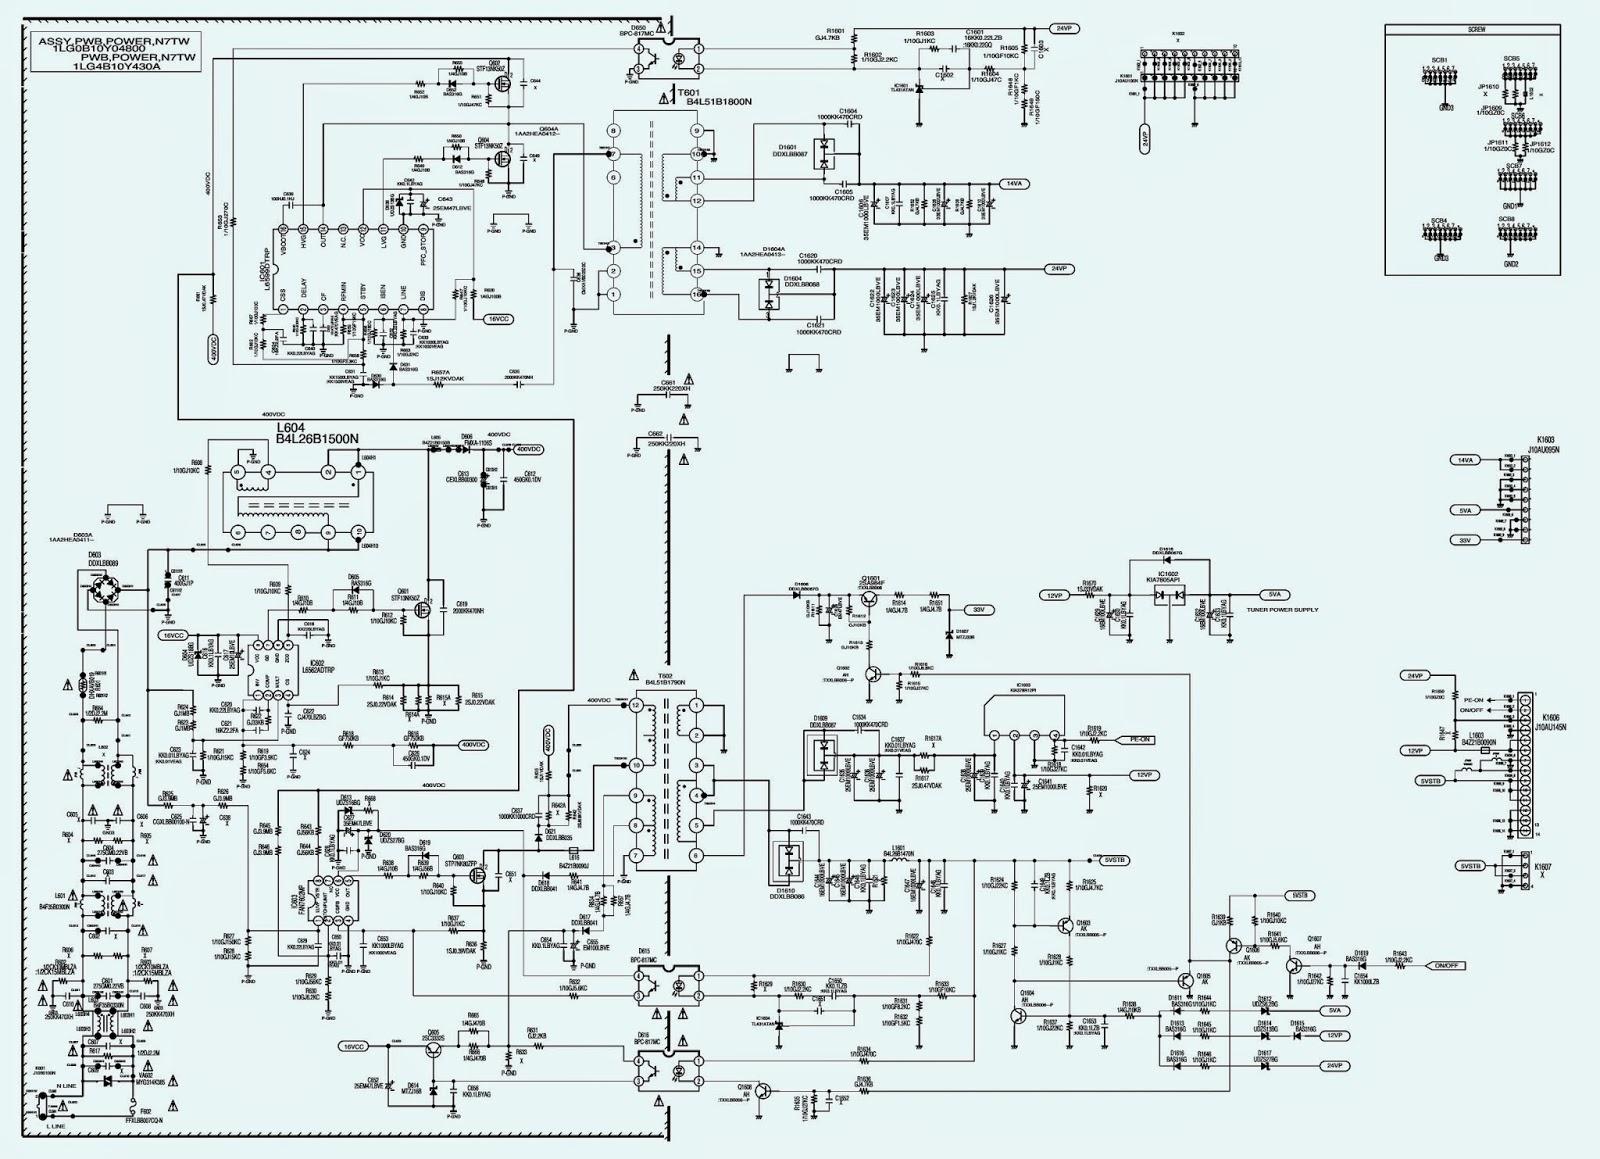 ELECTRONIC EQUIPMENT REPAIR CENTRE : SANYO 32XF7 SERVICE